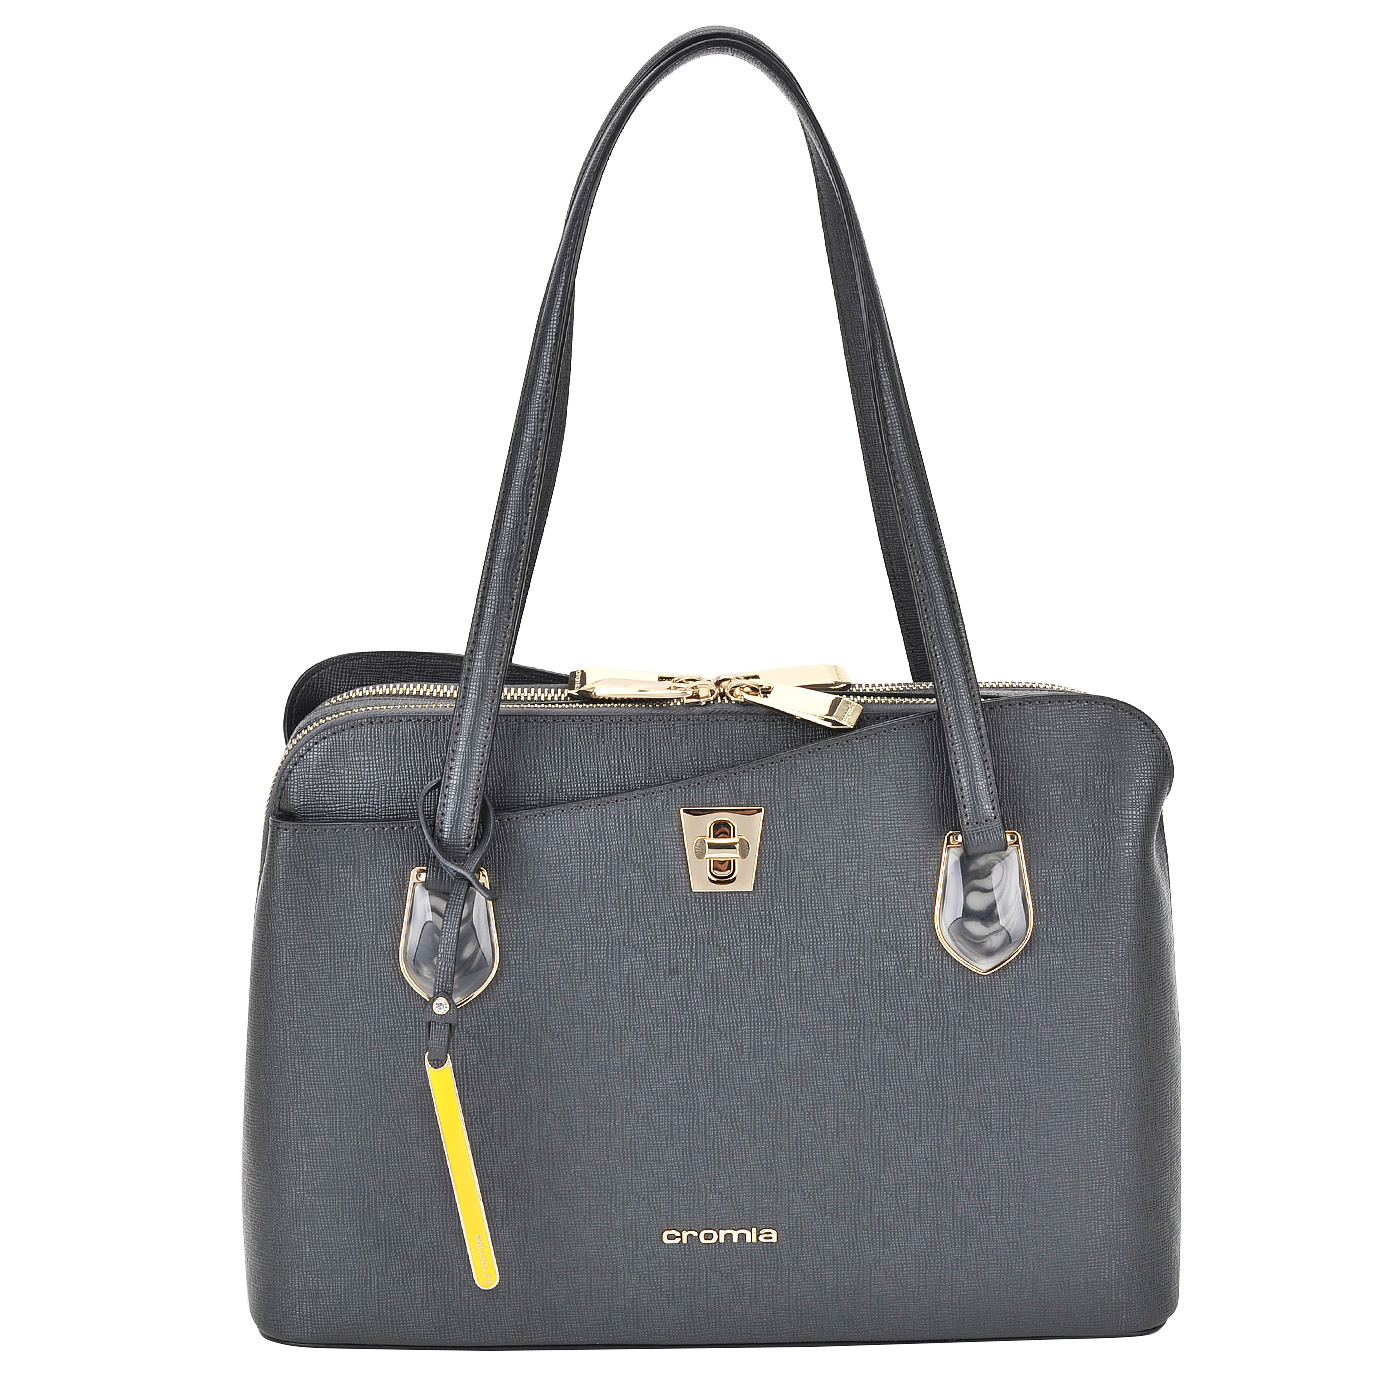 a6ea645335f3 Женская кожаная сумка Cromia Mina Женская кожаная сумка Cromia Mina ...